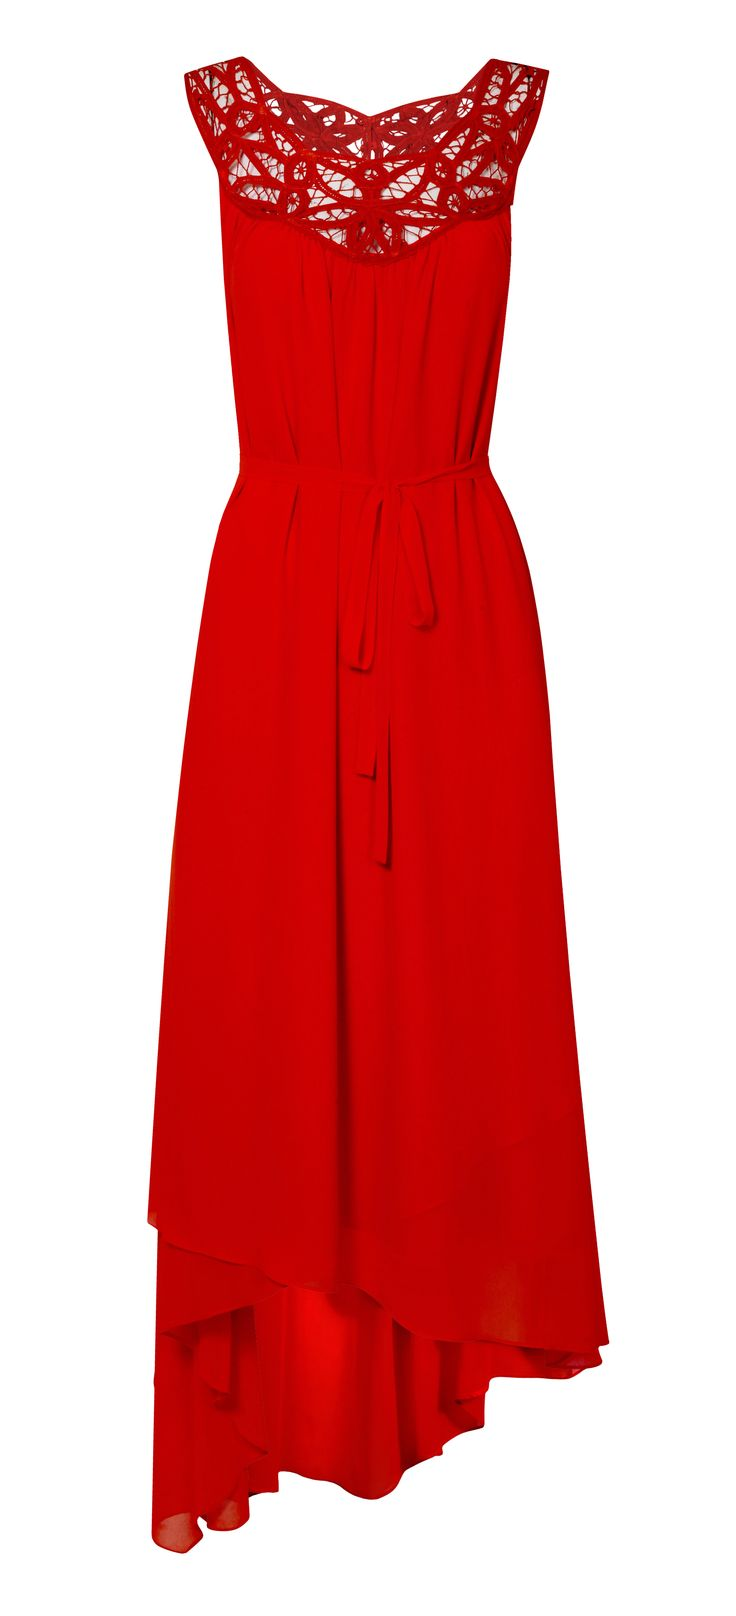 Viva Battenburg Eclipse Hem Dress, £99 www.phase-eight.co.uk